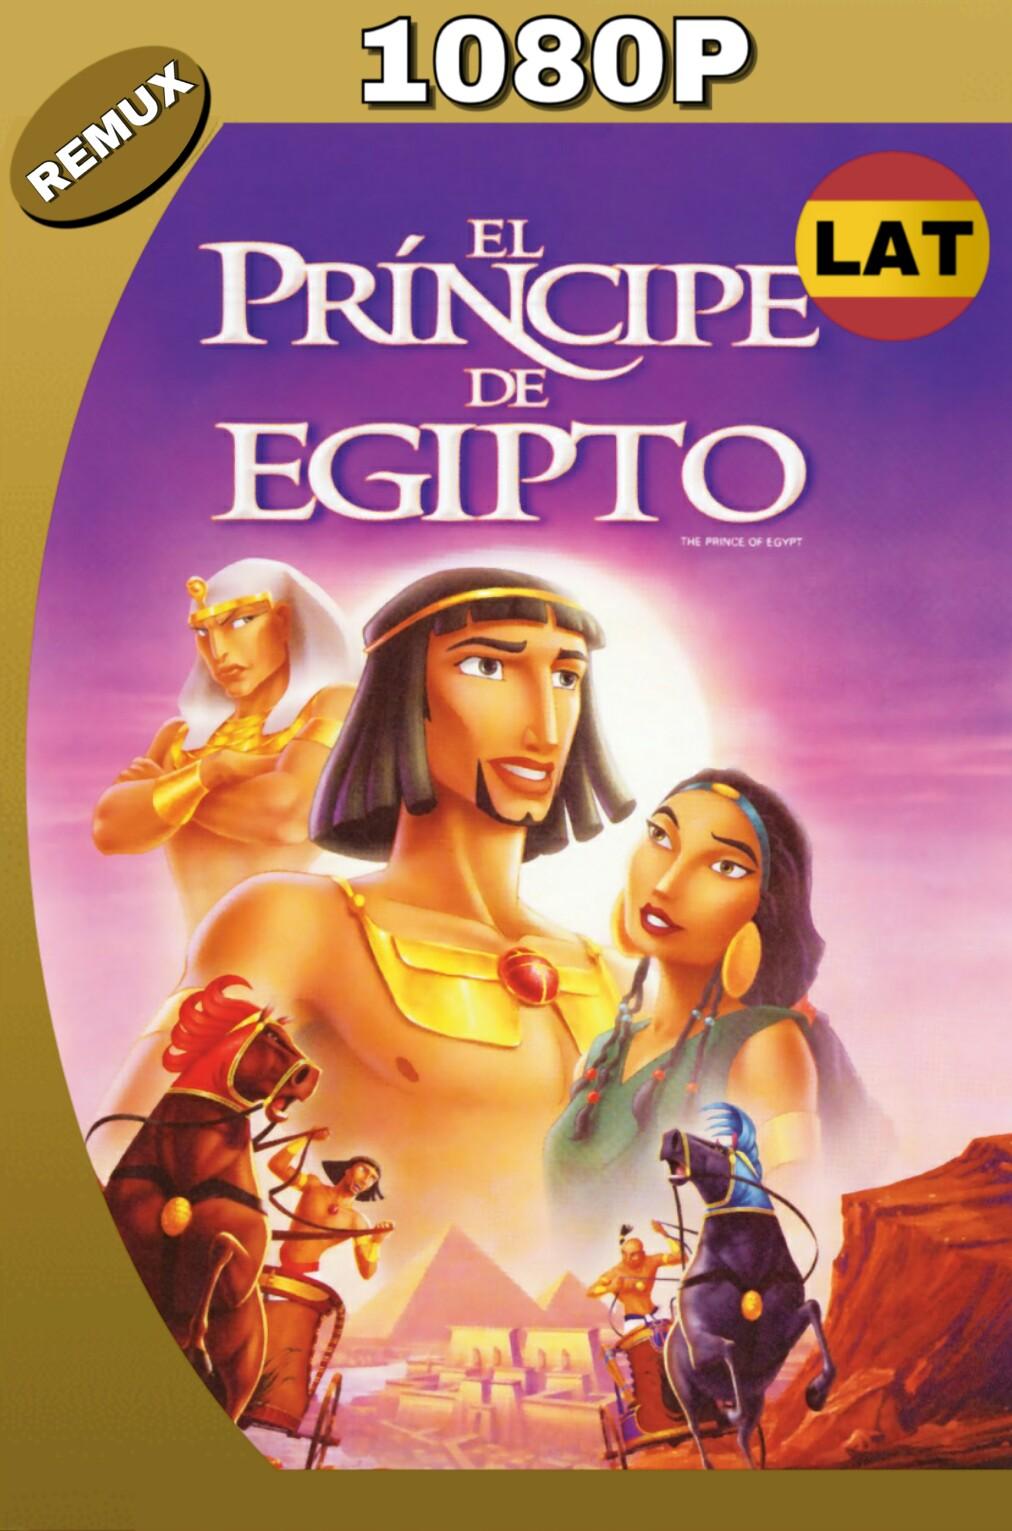 EL PRINCIPE DE EGIPTO (1998) BDREMUX 1080P LATINO-INGLES